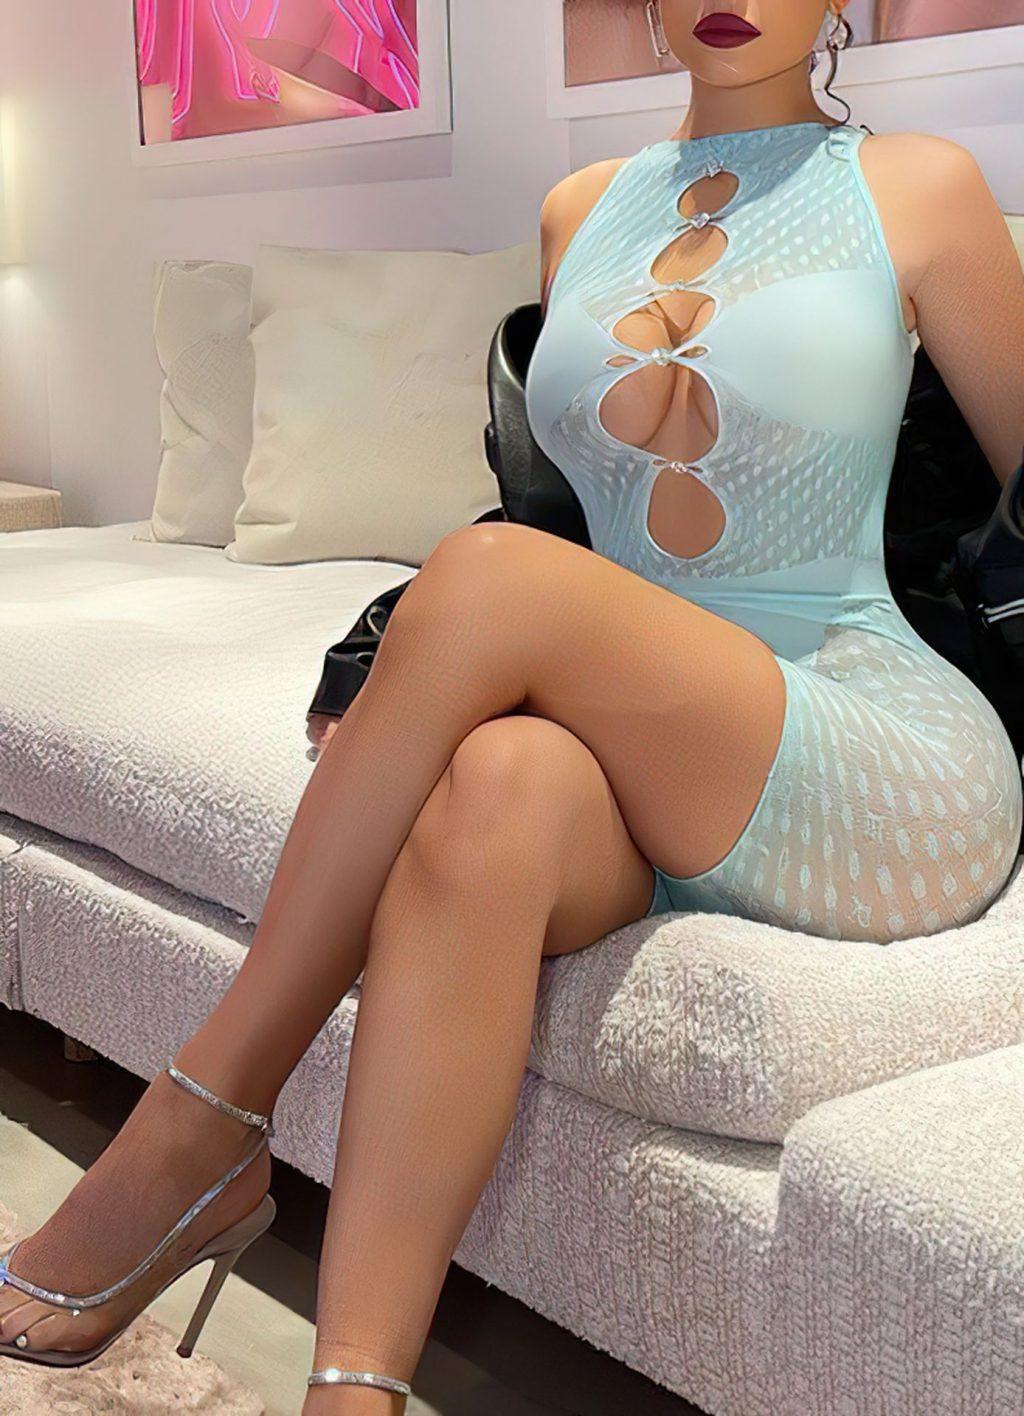 Kylie Jenner Hot (5 New Photos)